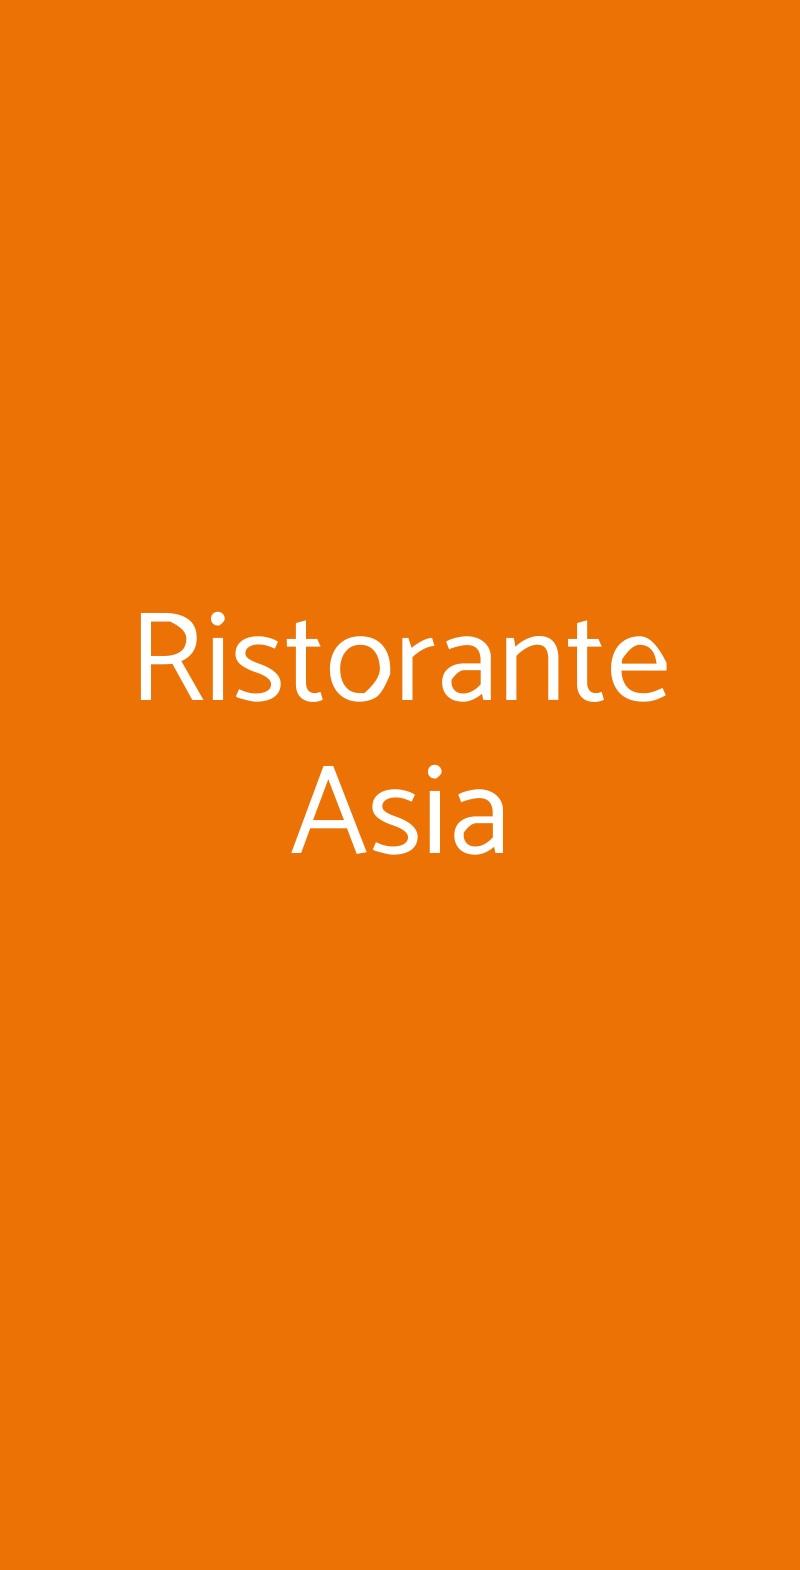 Ristorante Asia Torino menù 1 pagina